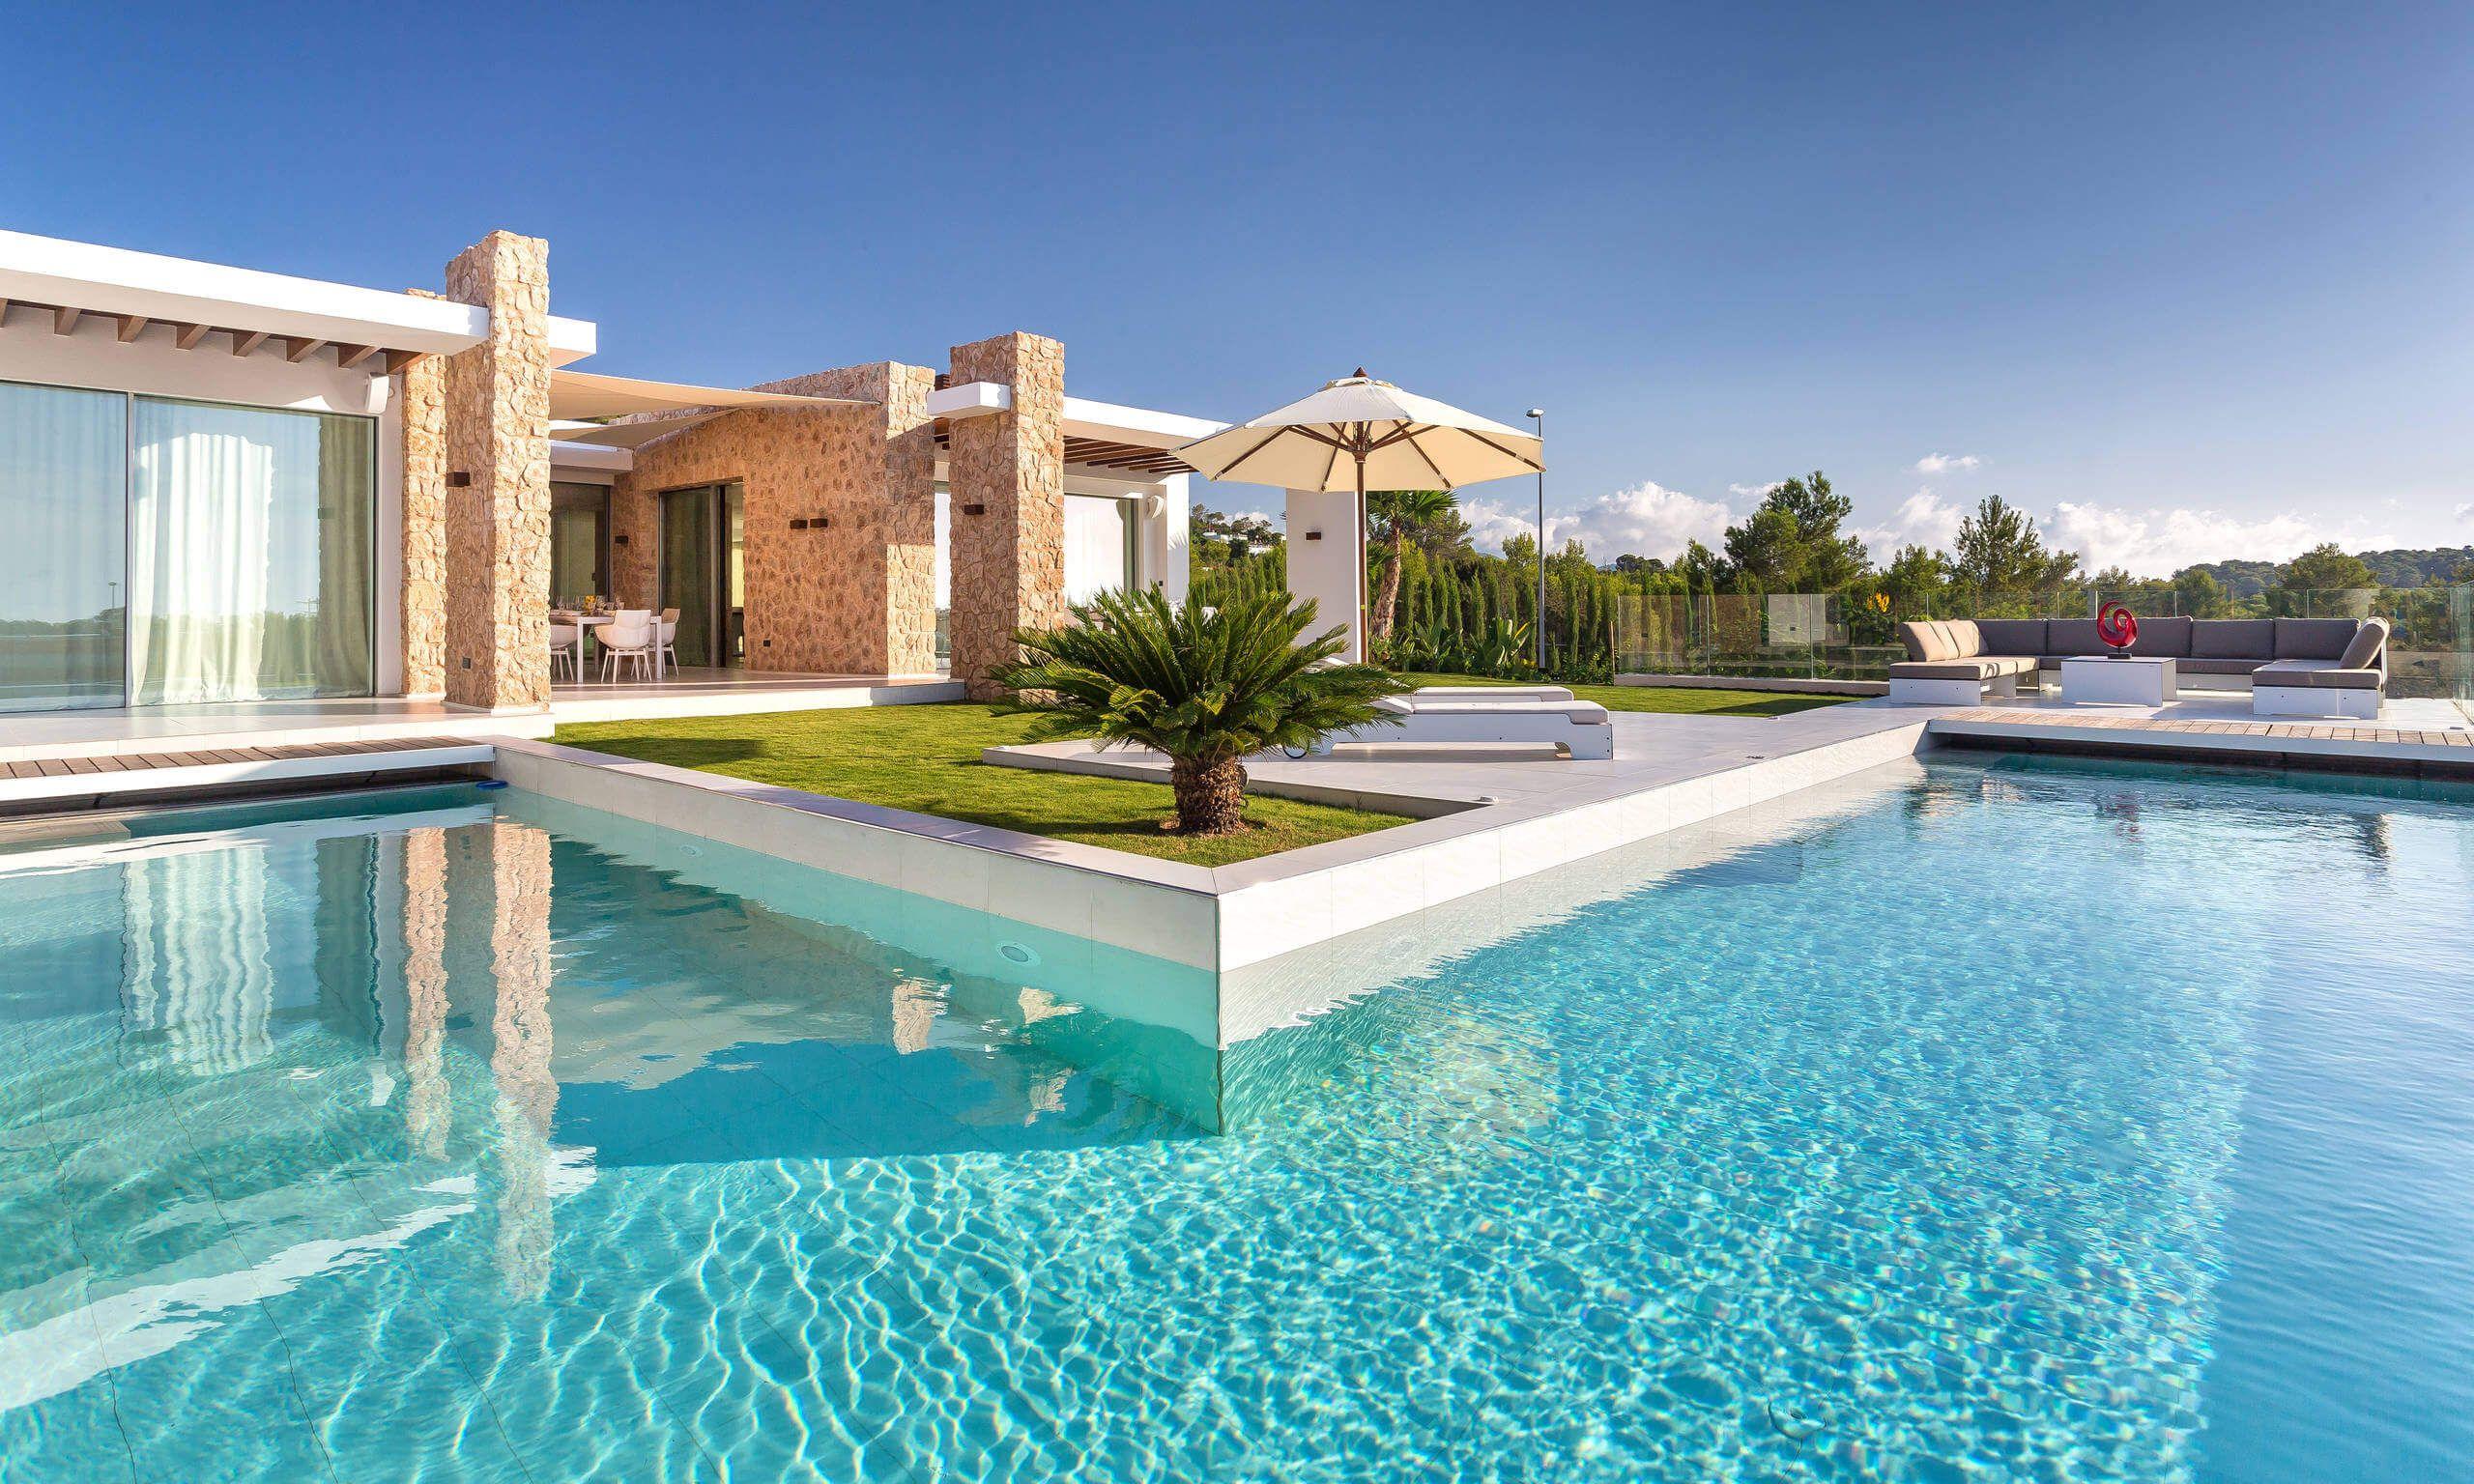 House In Ibiza By Studio43 Ibiza Luxury Villa Luxury Real Estate